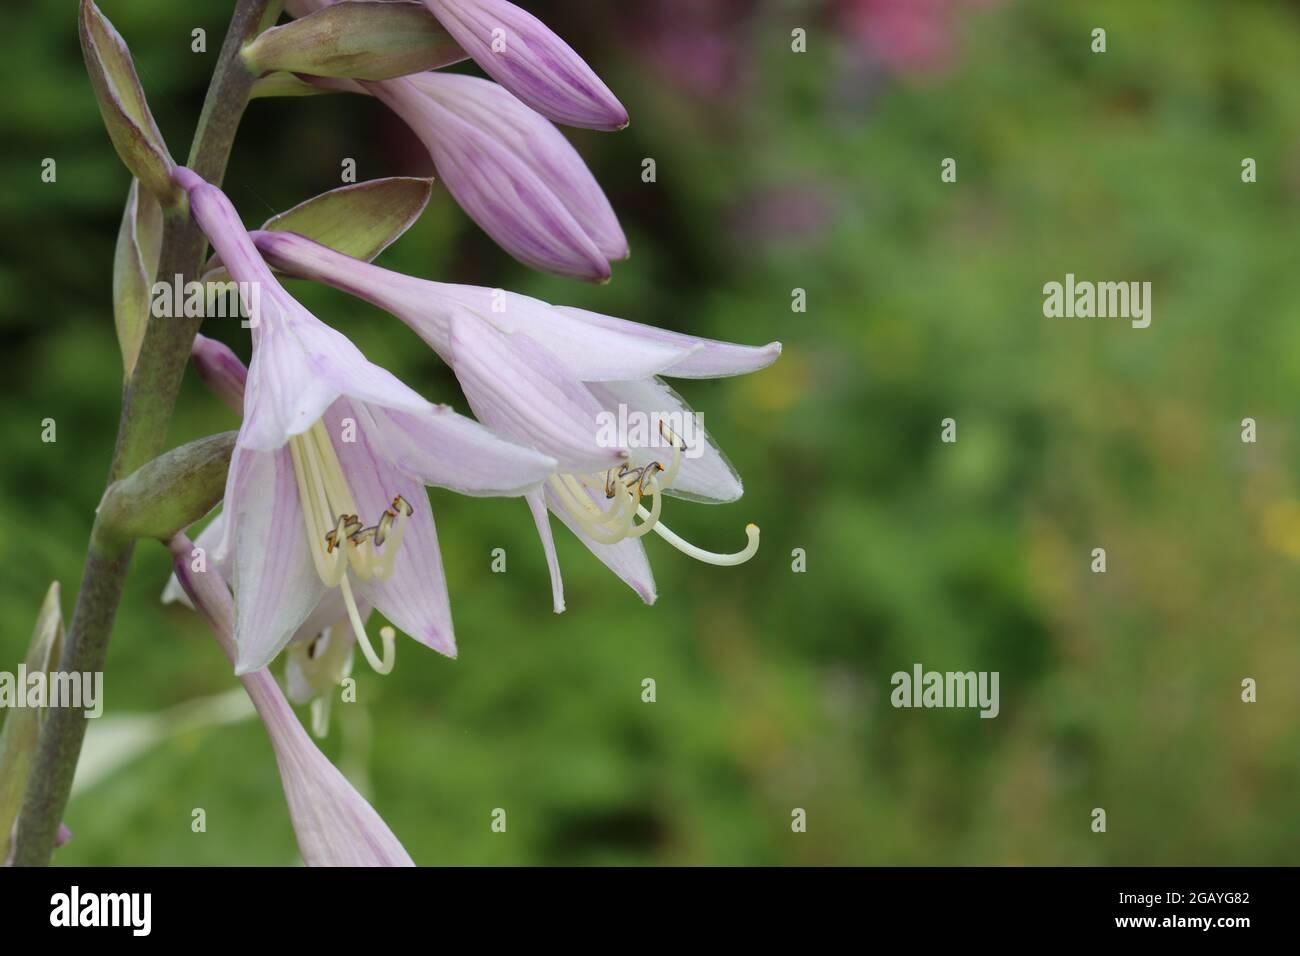 a lily-shaped blossom of a hosta Stock Photo